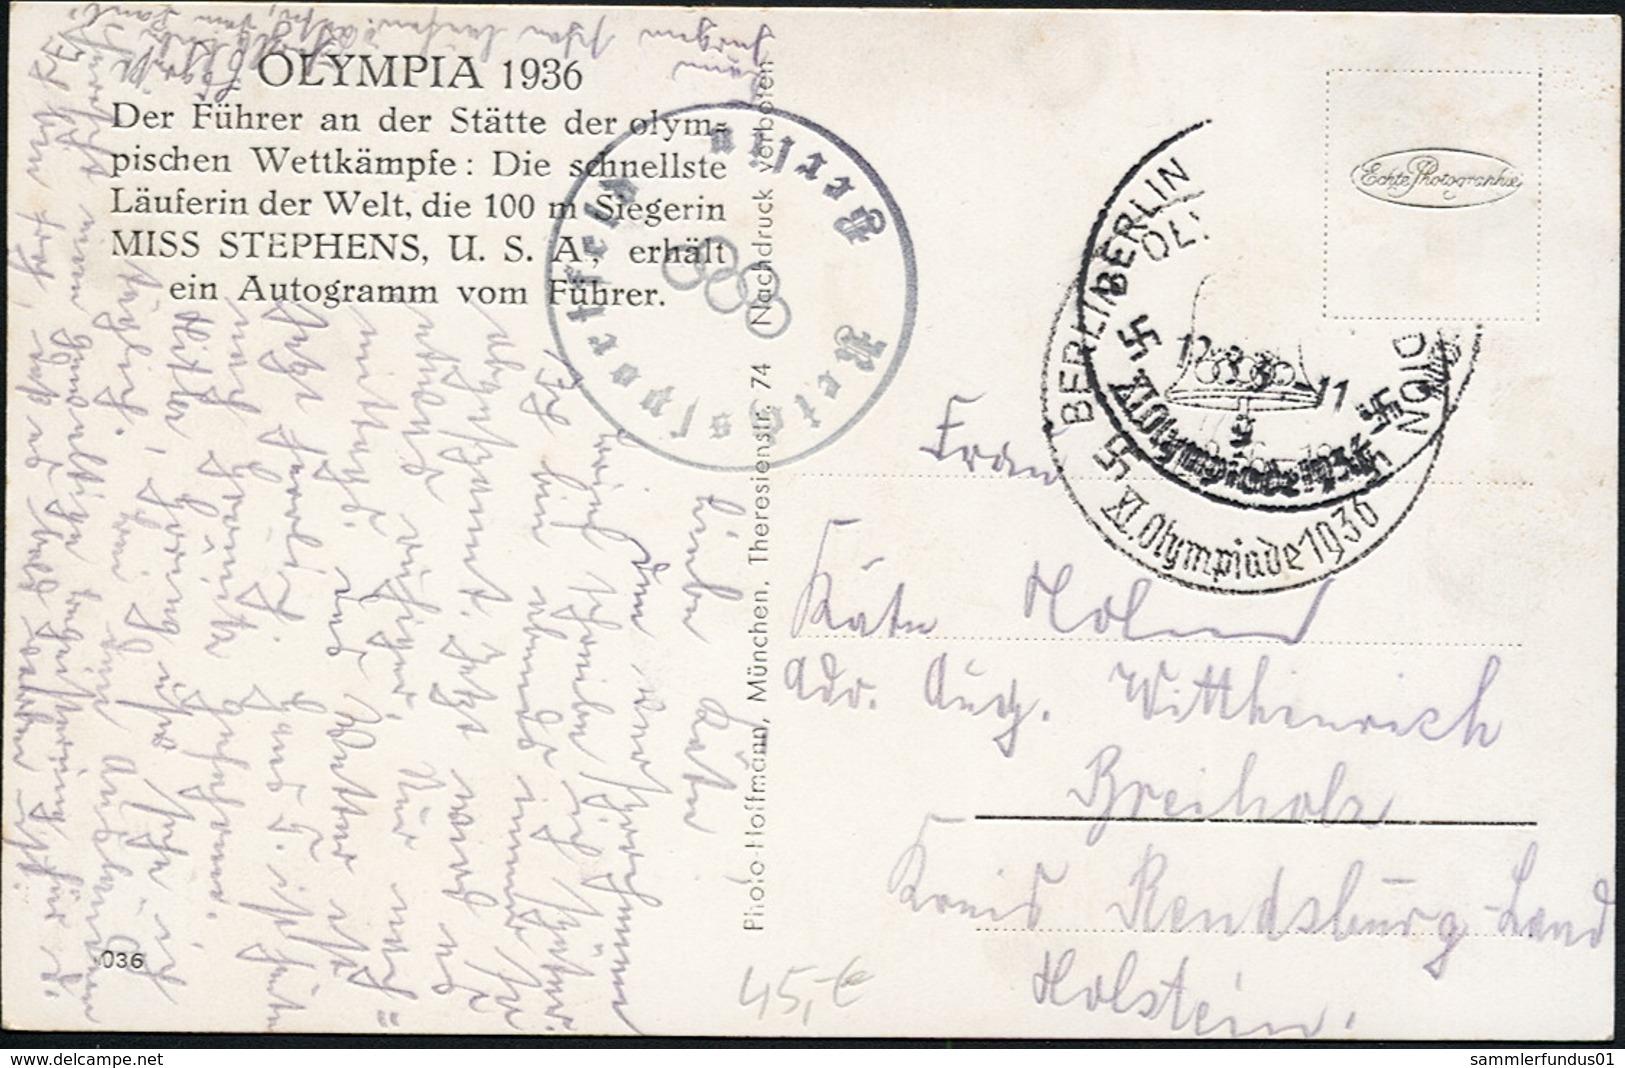 AK/CP R ! Propaganda  Hitler  Olympiade  Miss Stephens Erhält Autogramm  Gel/circ.1936   Erhaltung/Cond. 2-  Nr. 00817 - Guerre 1939-45